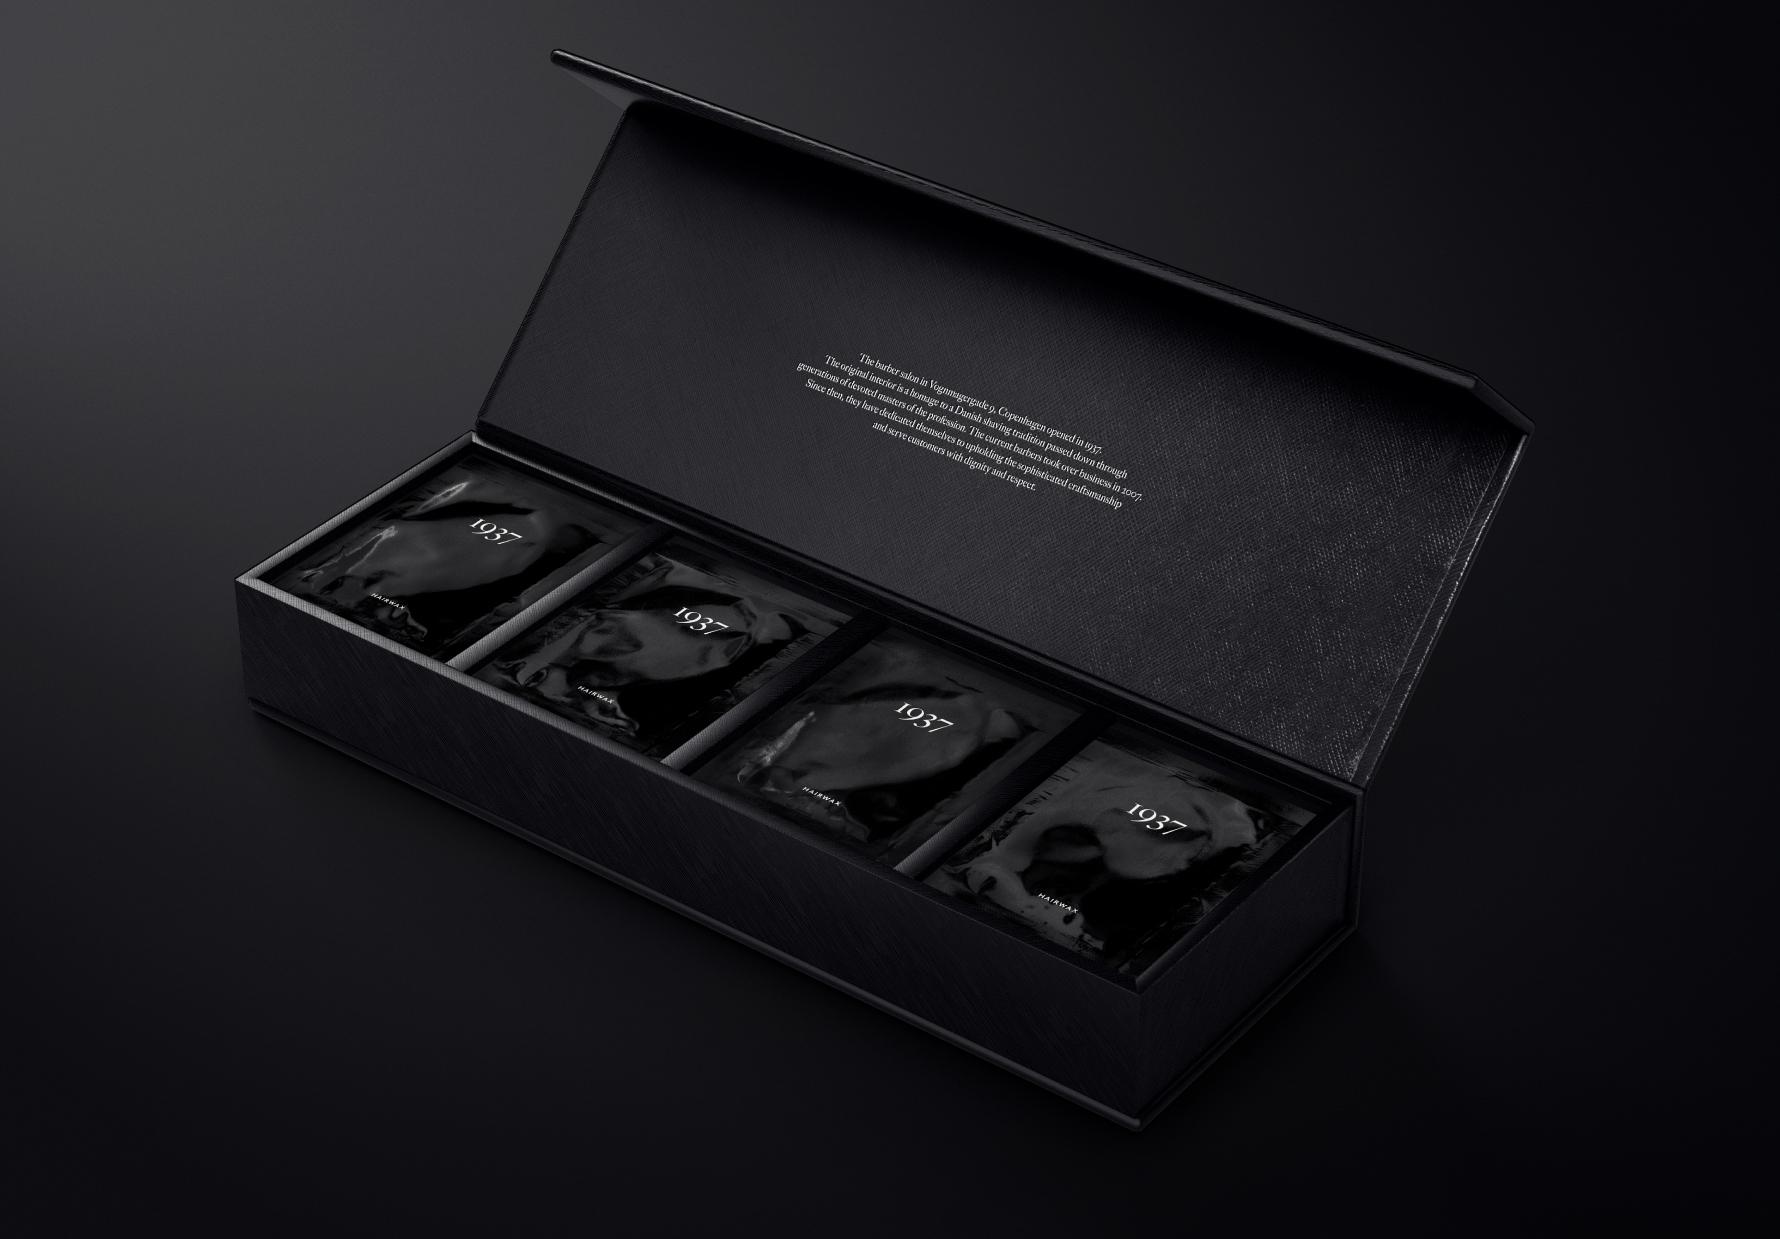 box-06.jpg